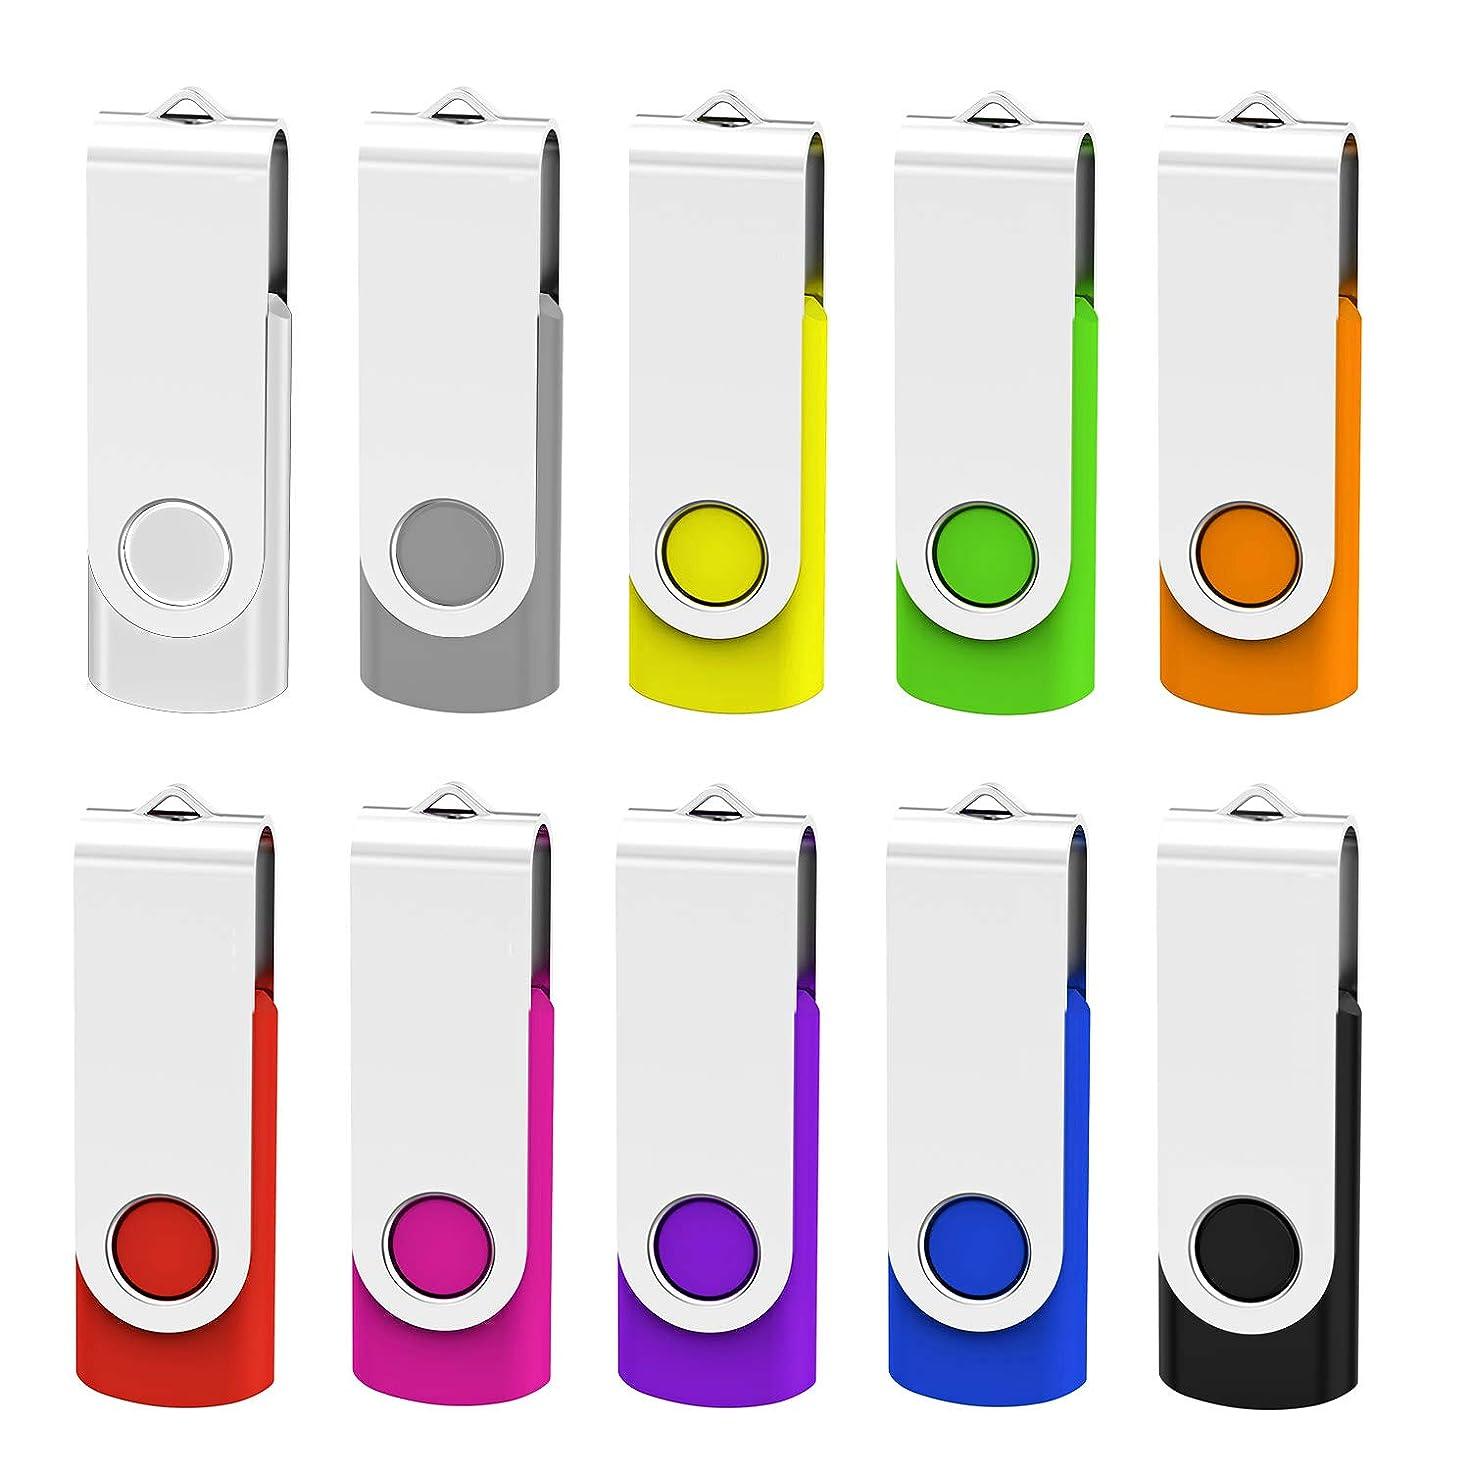 KEATHY 10 Pack 32GB USB Flash Drive USB 2.0 Swivel Thumb Drive Memory Stick Jump Drive Pen Drive - 10 Mixed Color